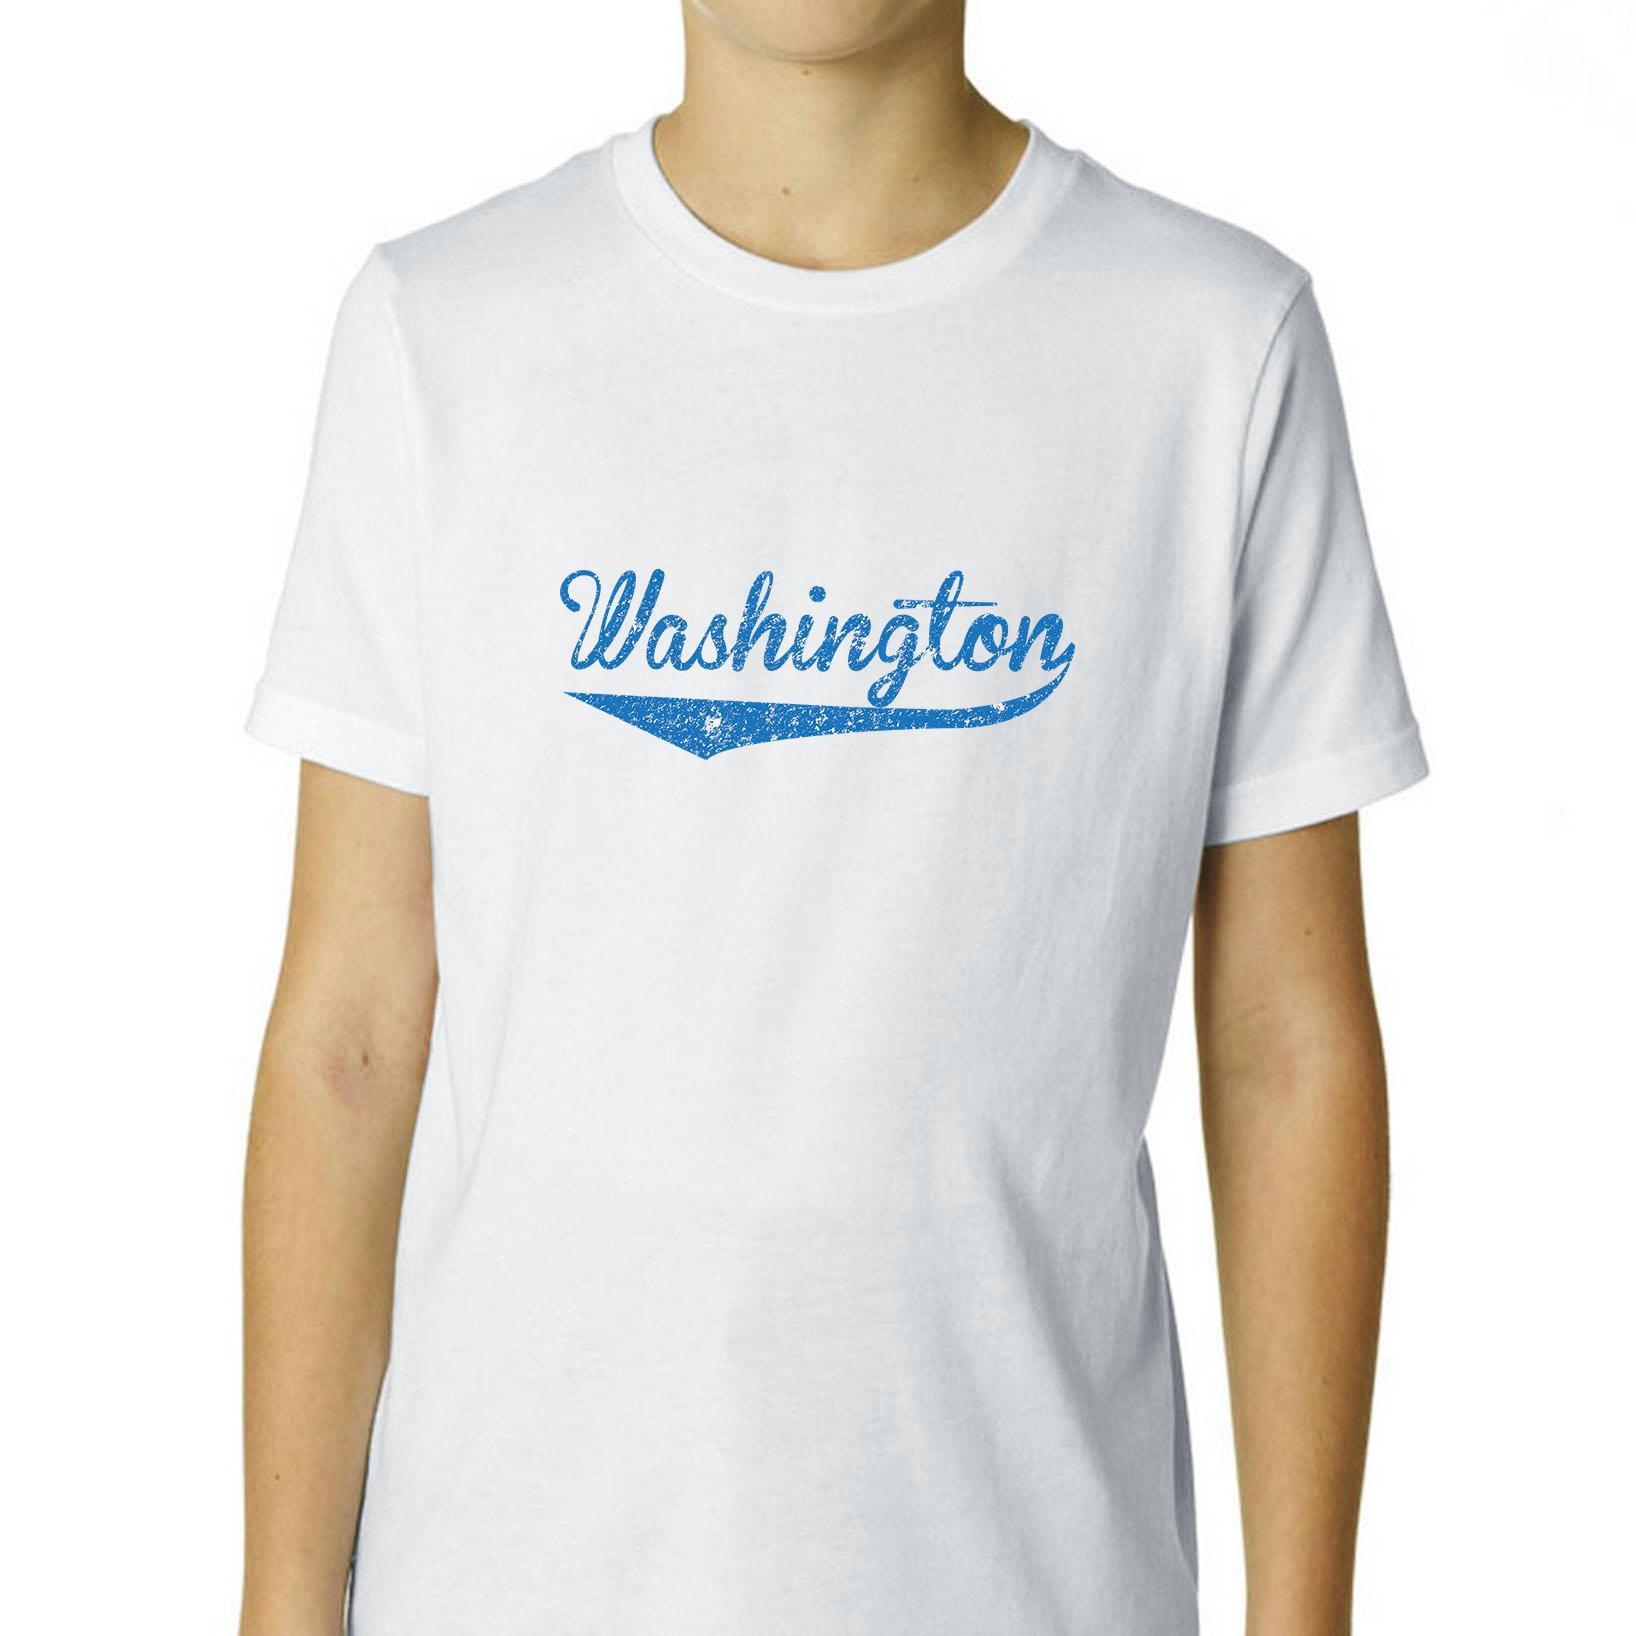 Simple Trendy Washington D.C. Stylized Print Boy's Cotton